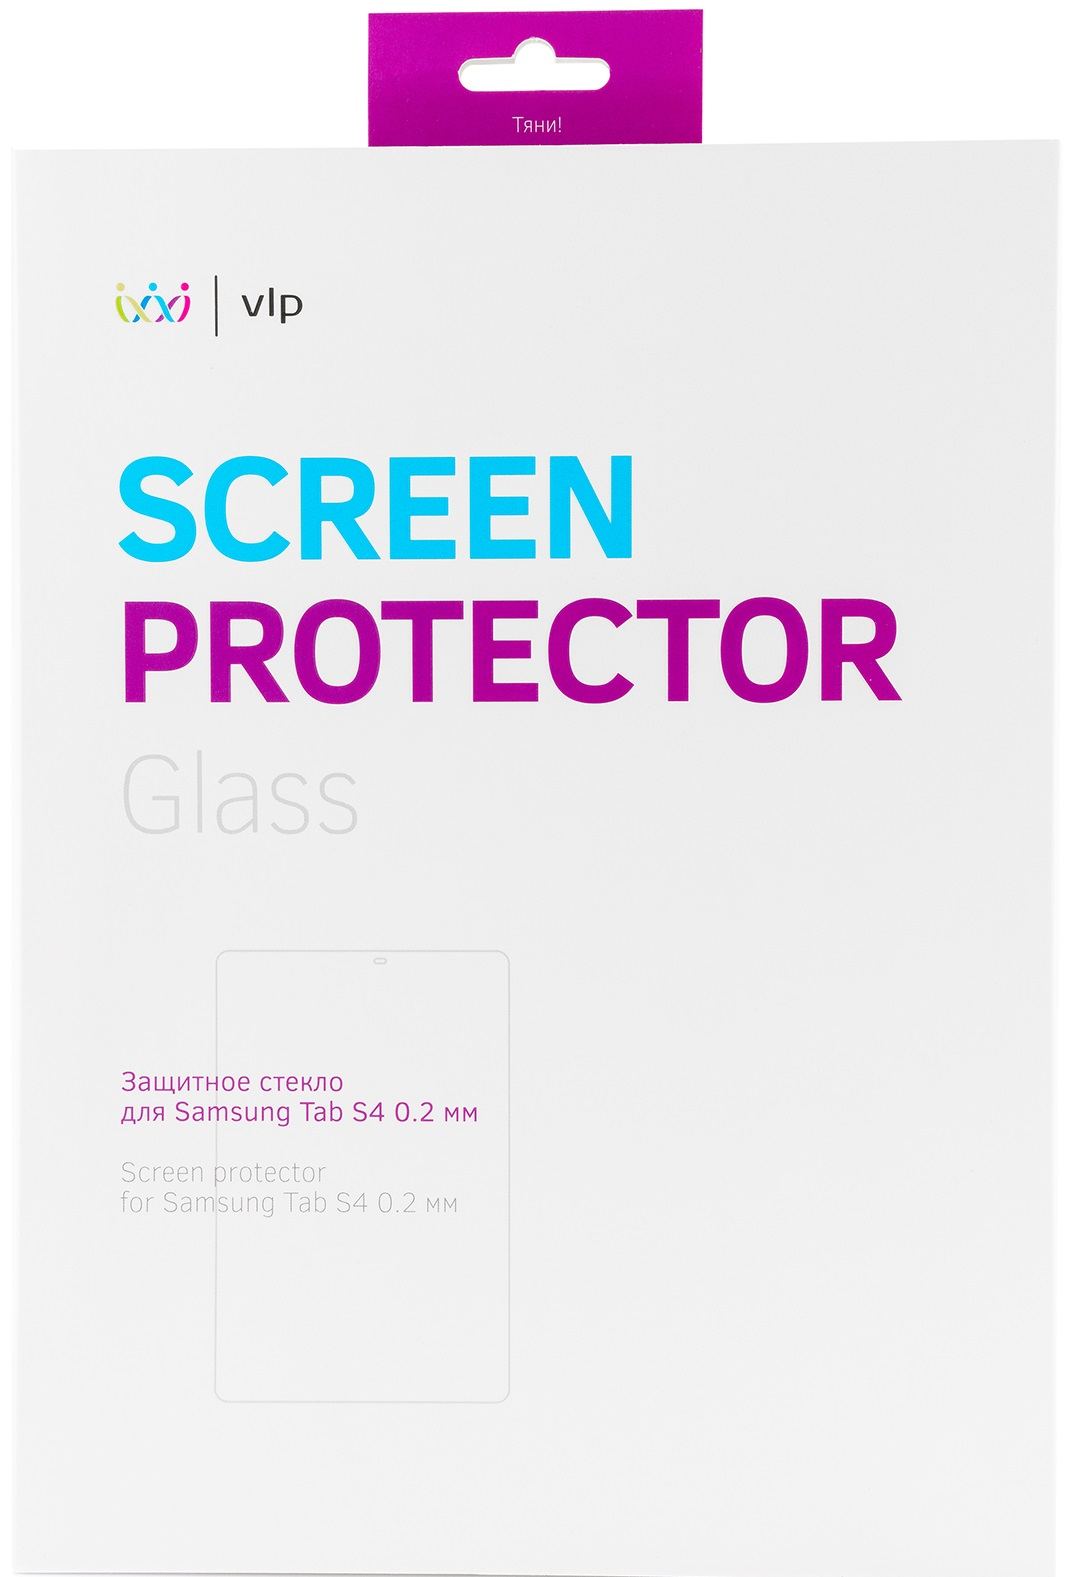 Стекло защитное VLP для Samsung Galaxy Tab S4 10.5